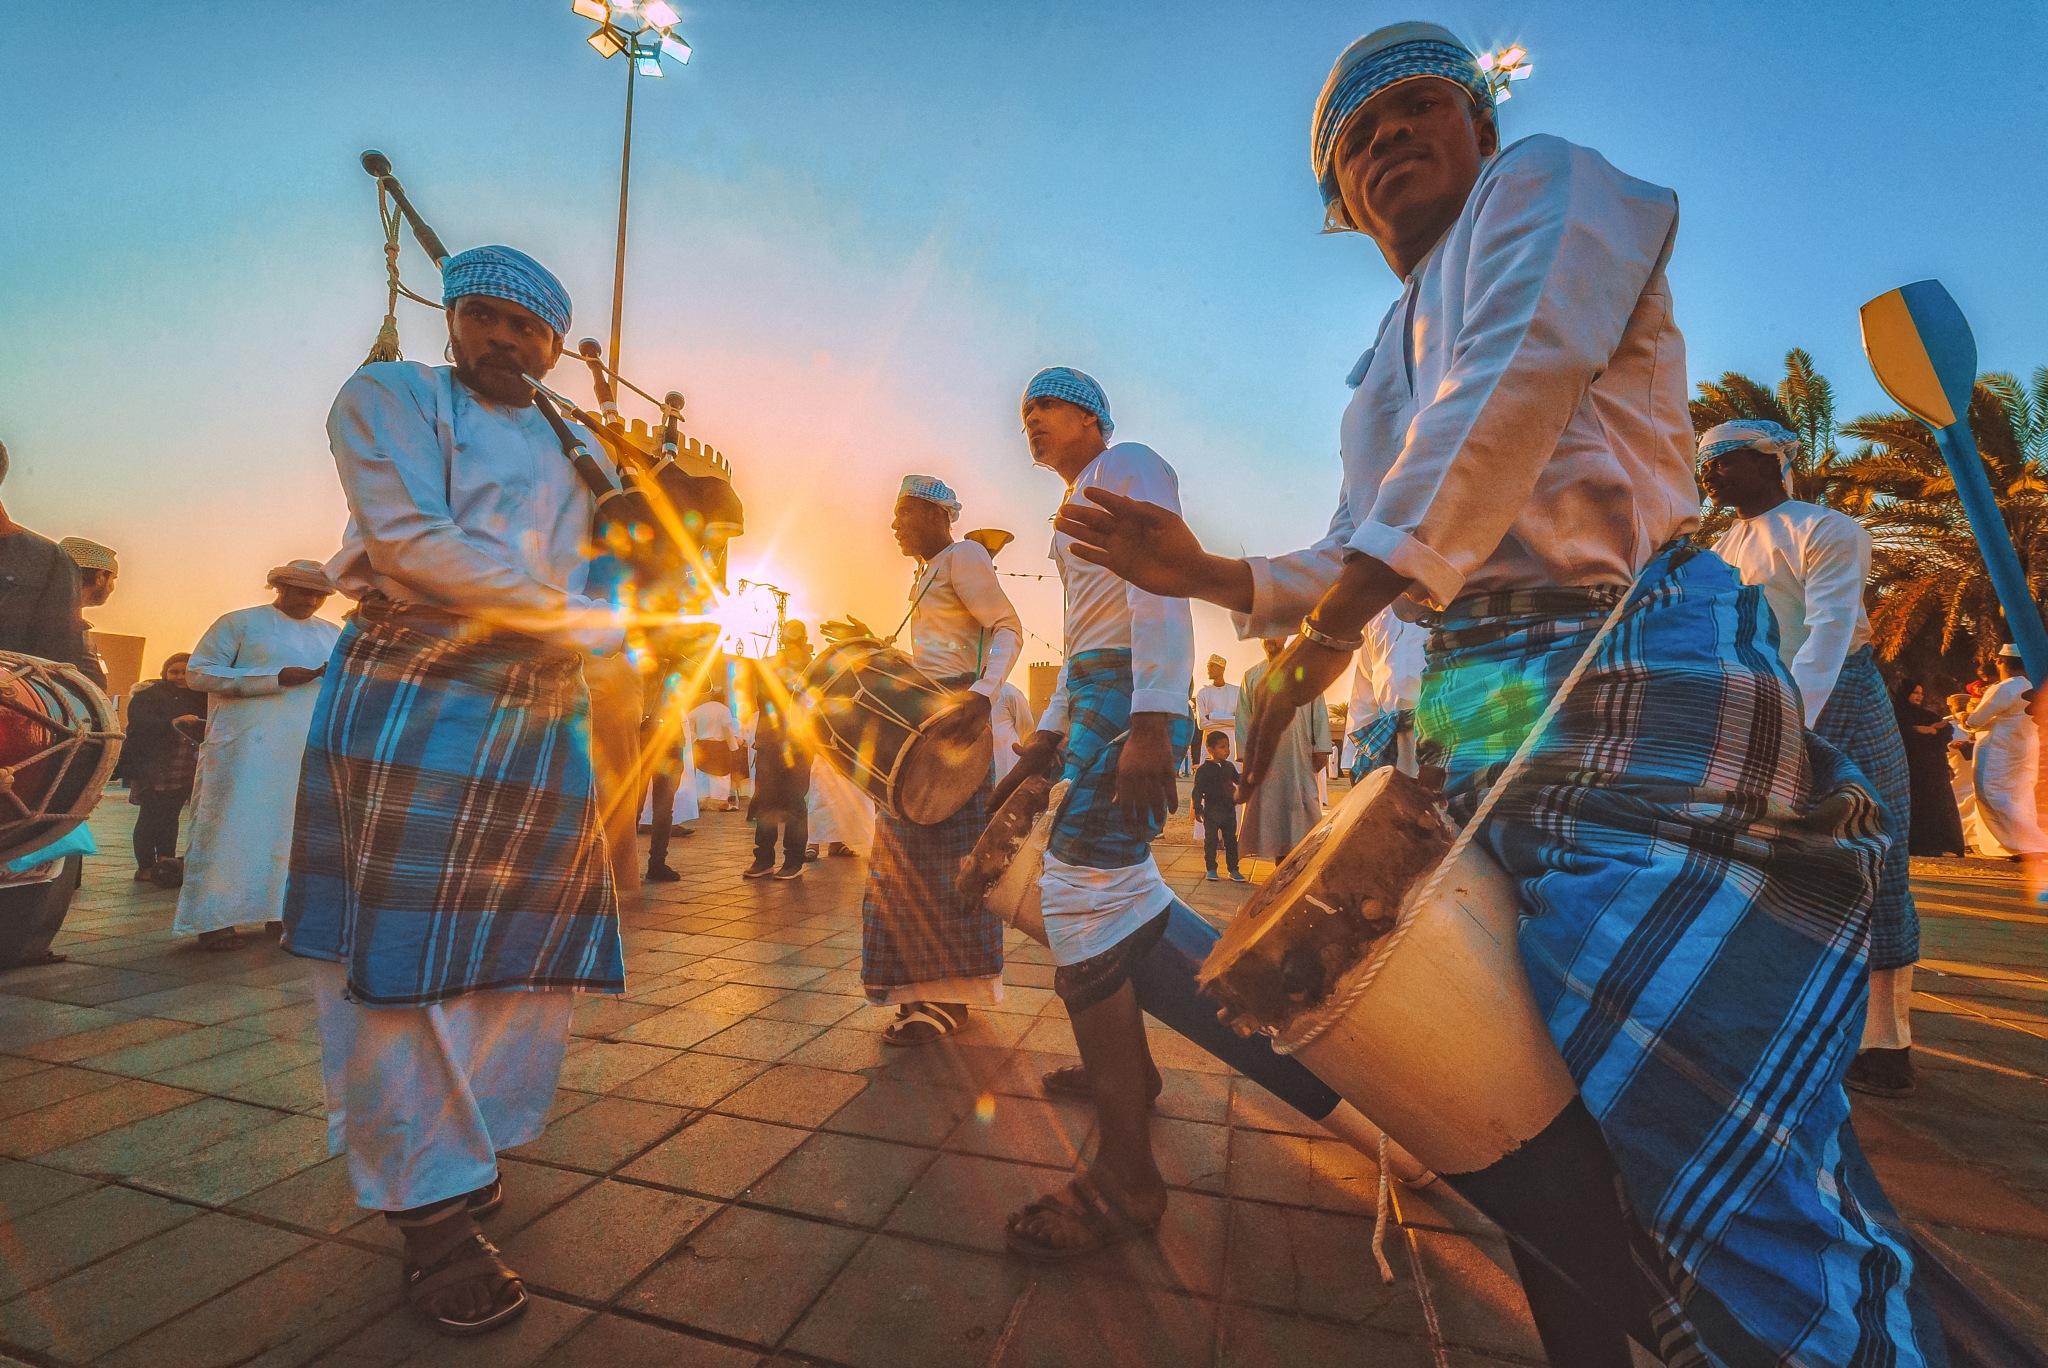 Omani Fann at-Tambura (a dance for healing) by Amir Hussain